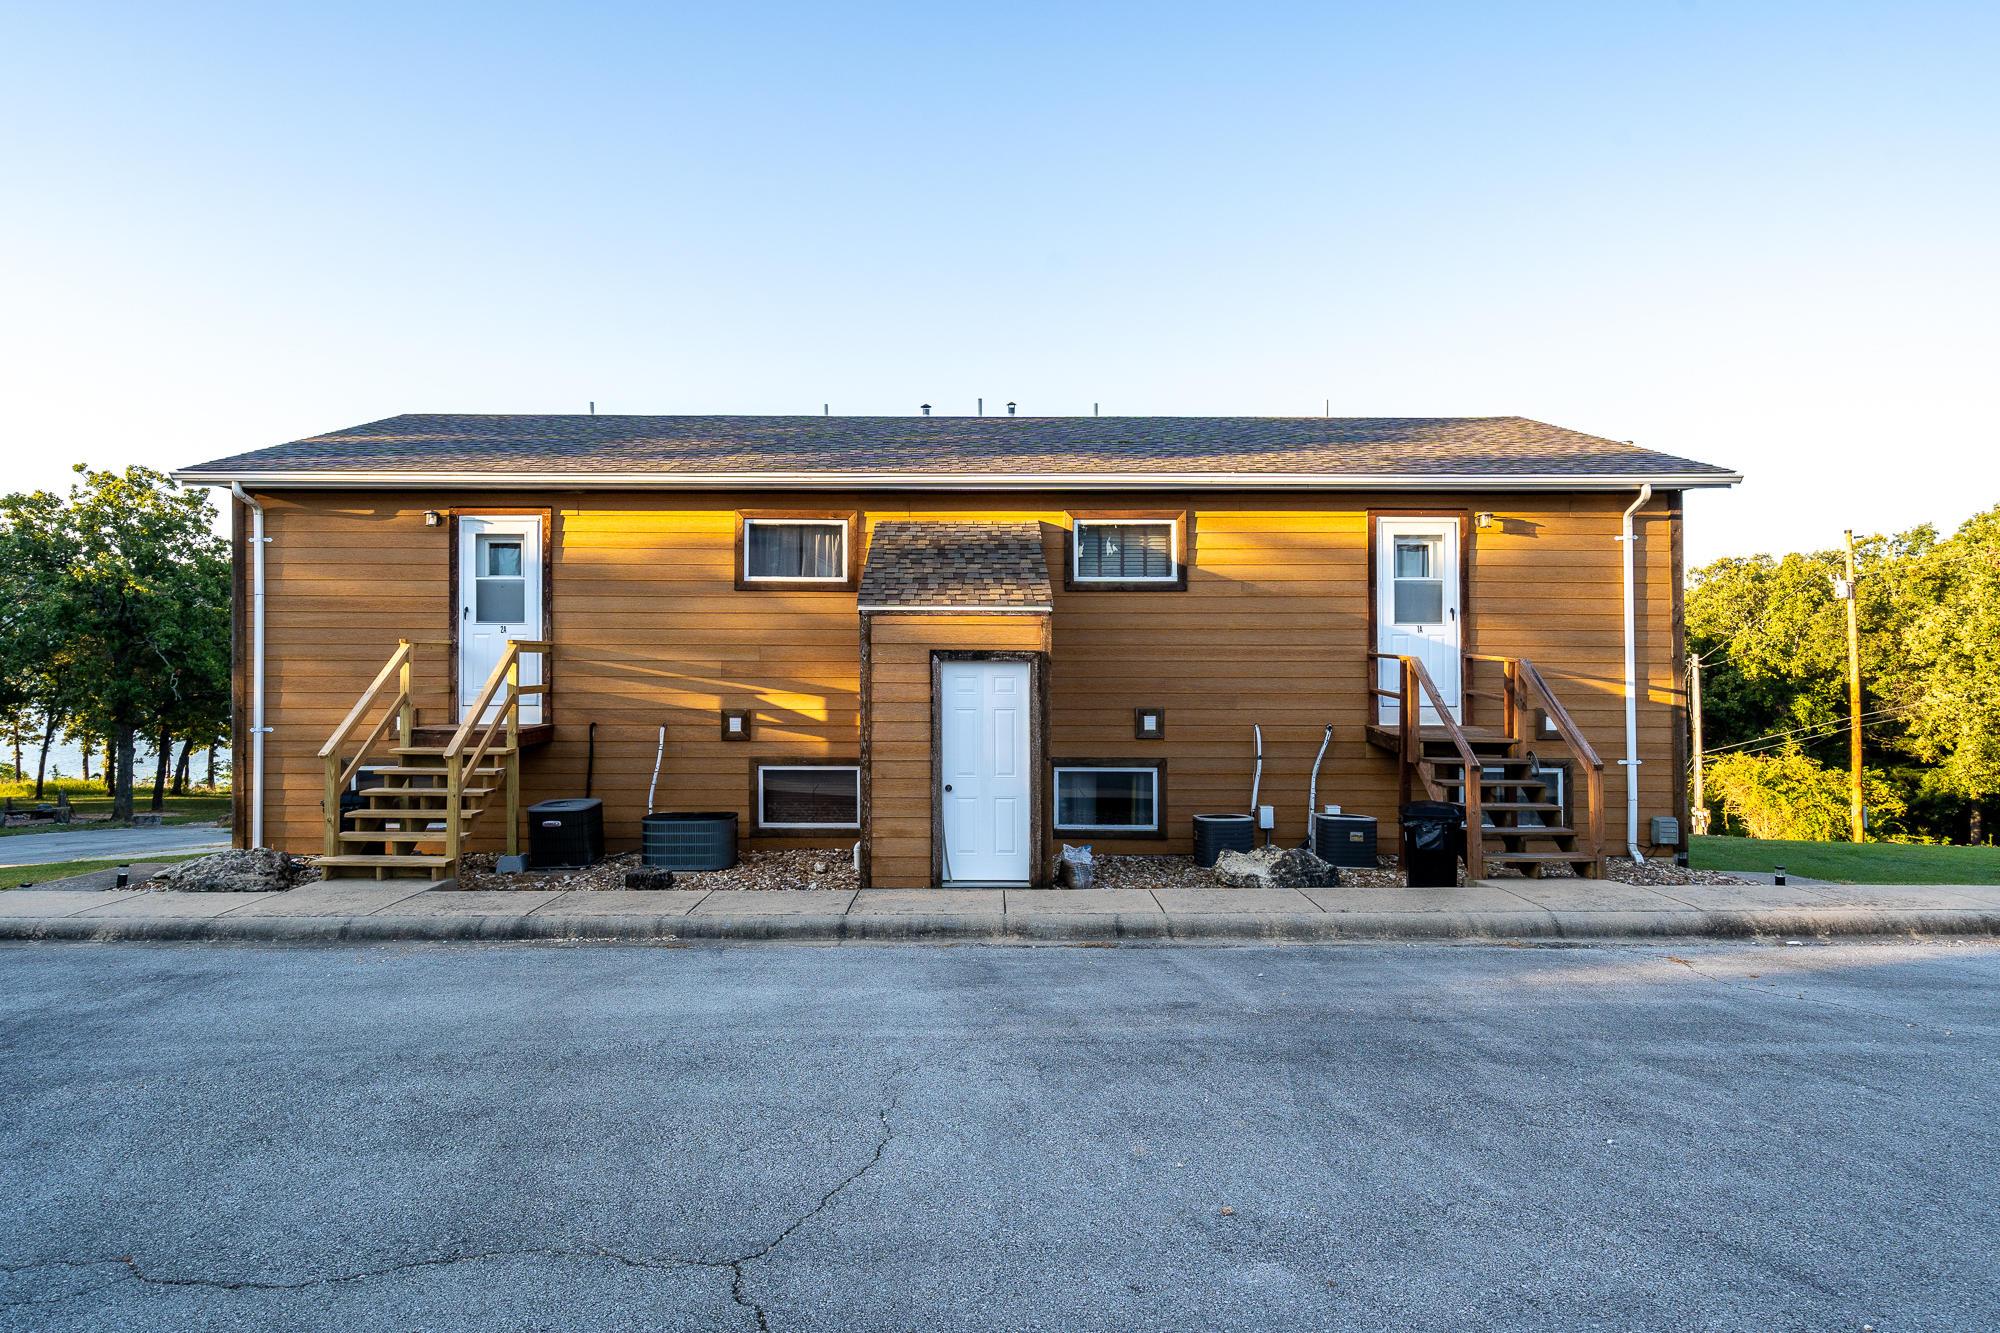 92 Ashlee Marie Lane Kimberling City, MO 65686